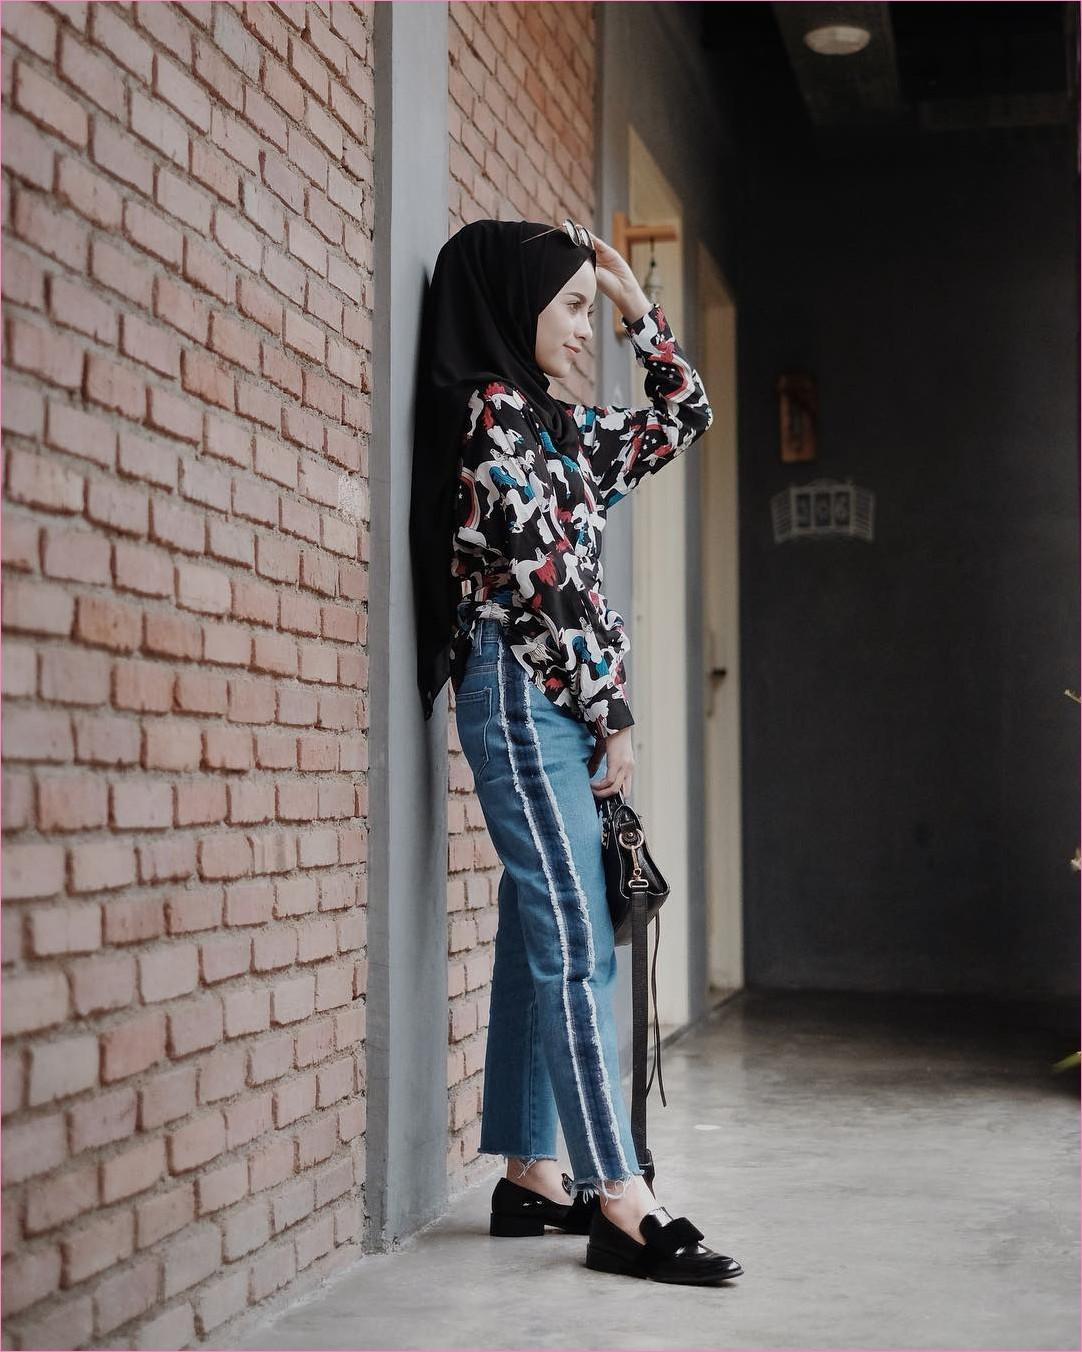 Outfit Kerudung Pashmina Ala Selebgram 2018 hijab pashmina diamond loafers andslip ons hitam top blouse baju kemeja celana jeans denim sobek slingbags kacamata bulat emas ootd trendy kekinian hijabers tembok batu bata